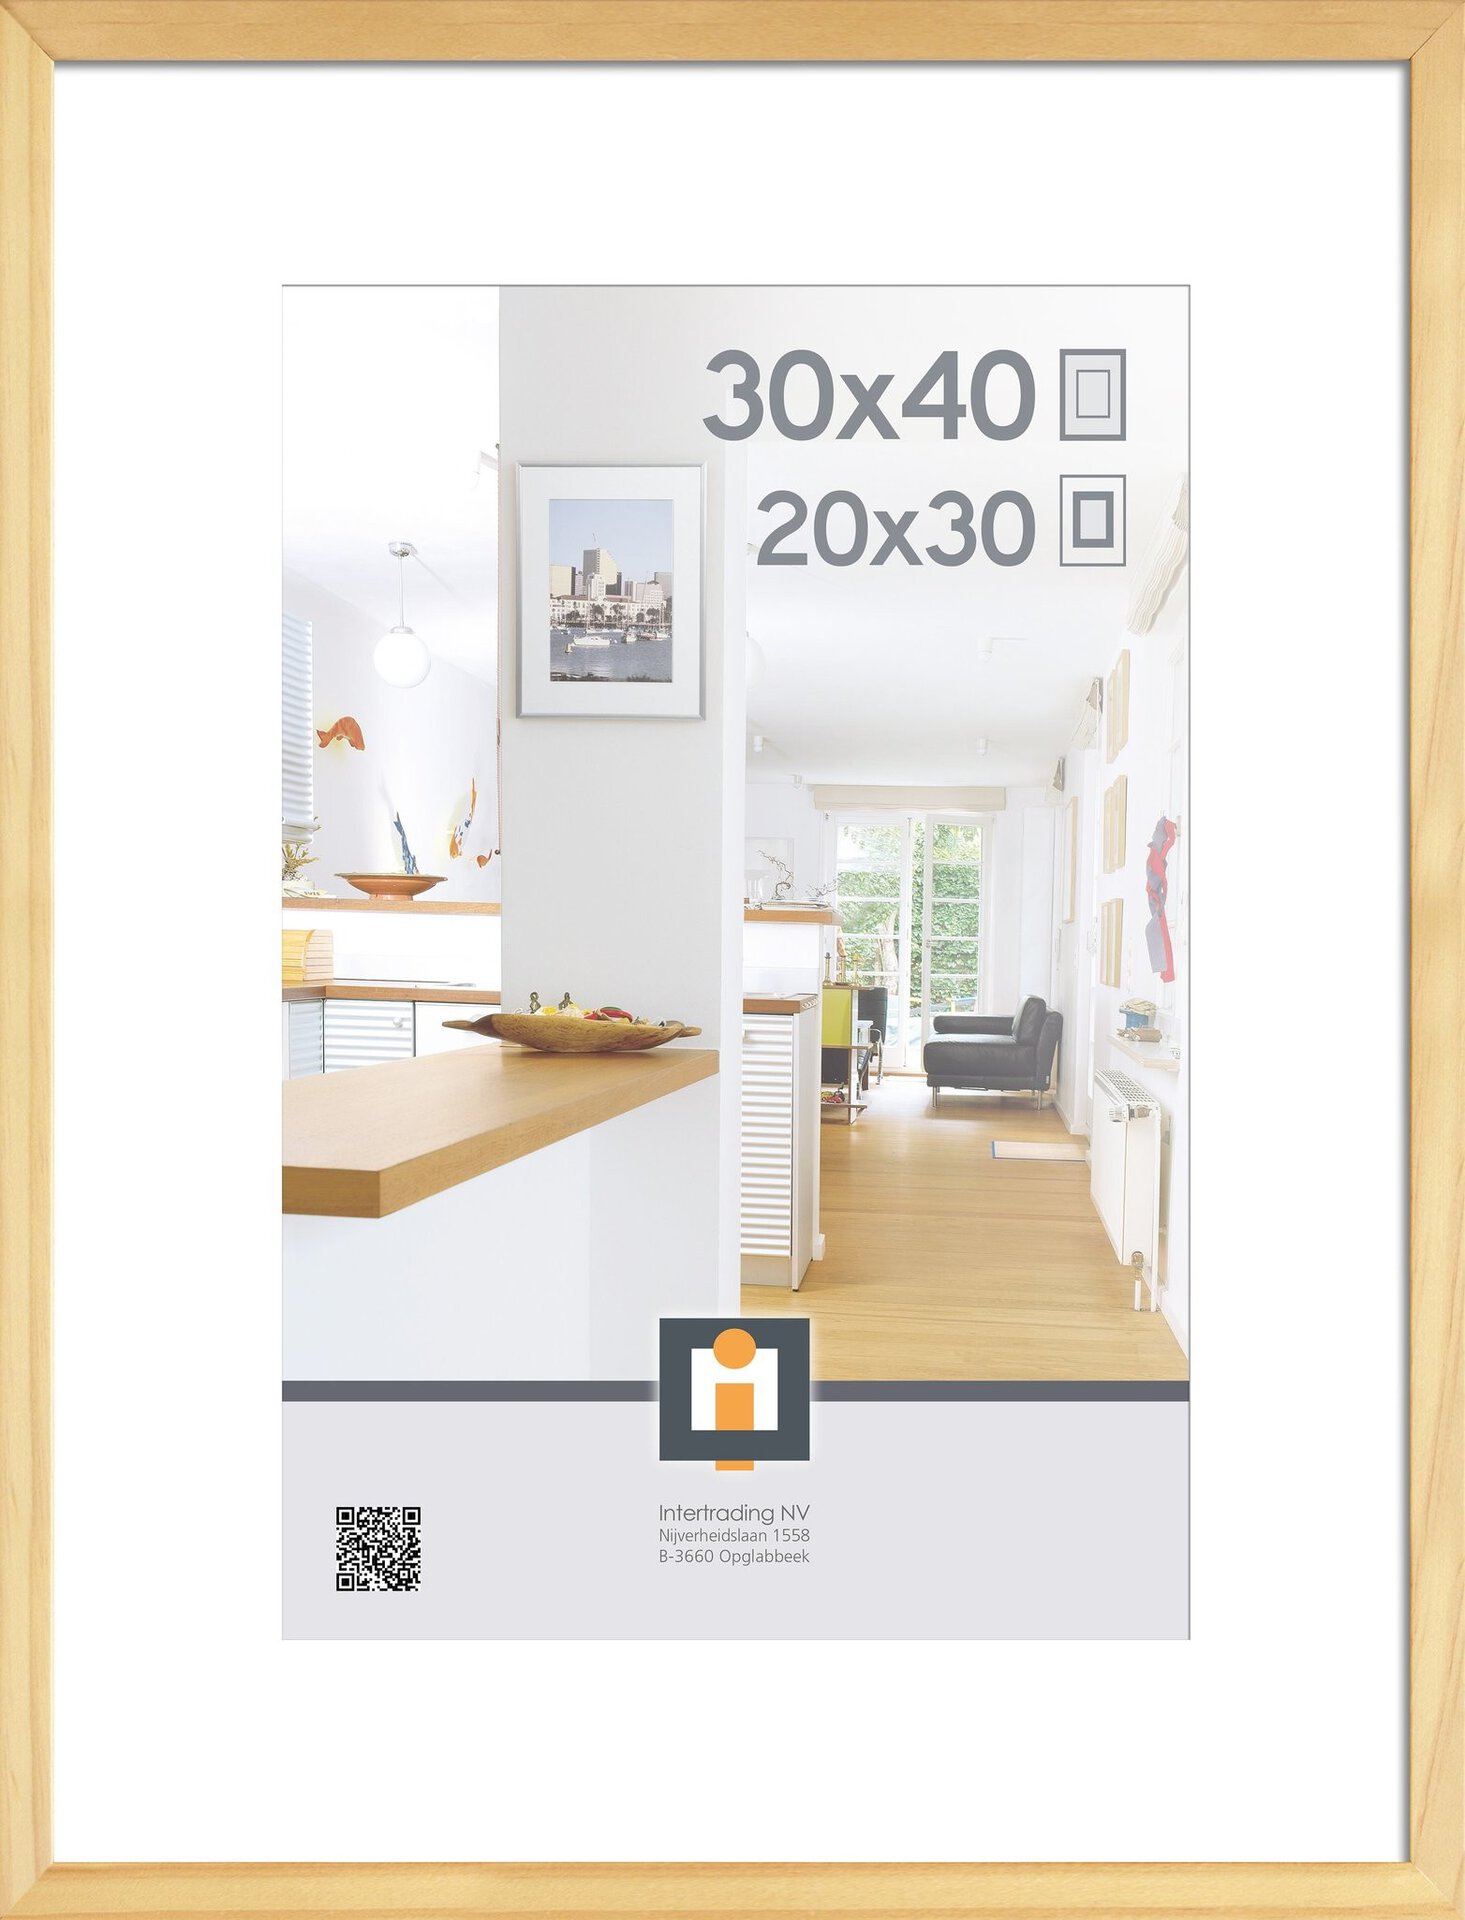 Bilderrahmen GÖTEBORG INTERTRADING Kunststoff 32 x 42 x 2 cm